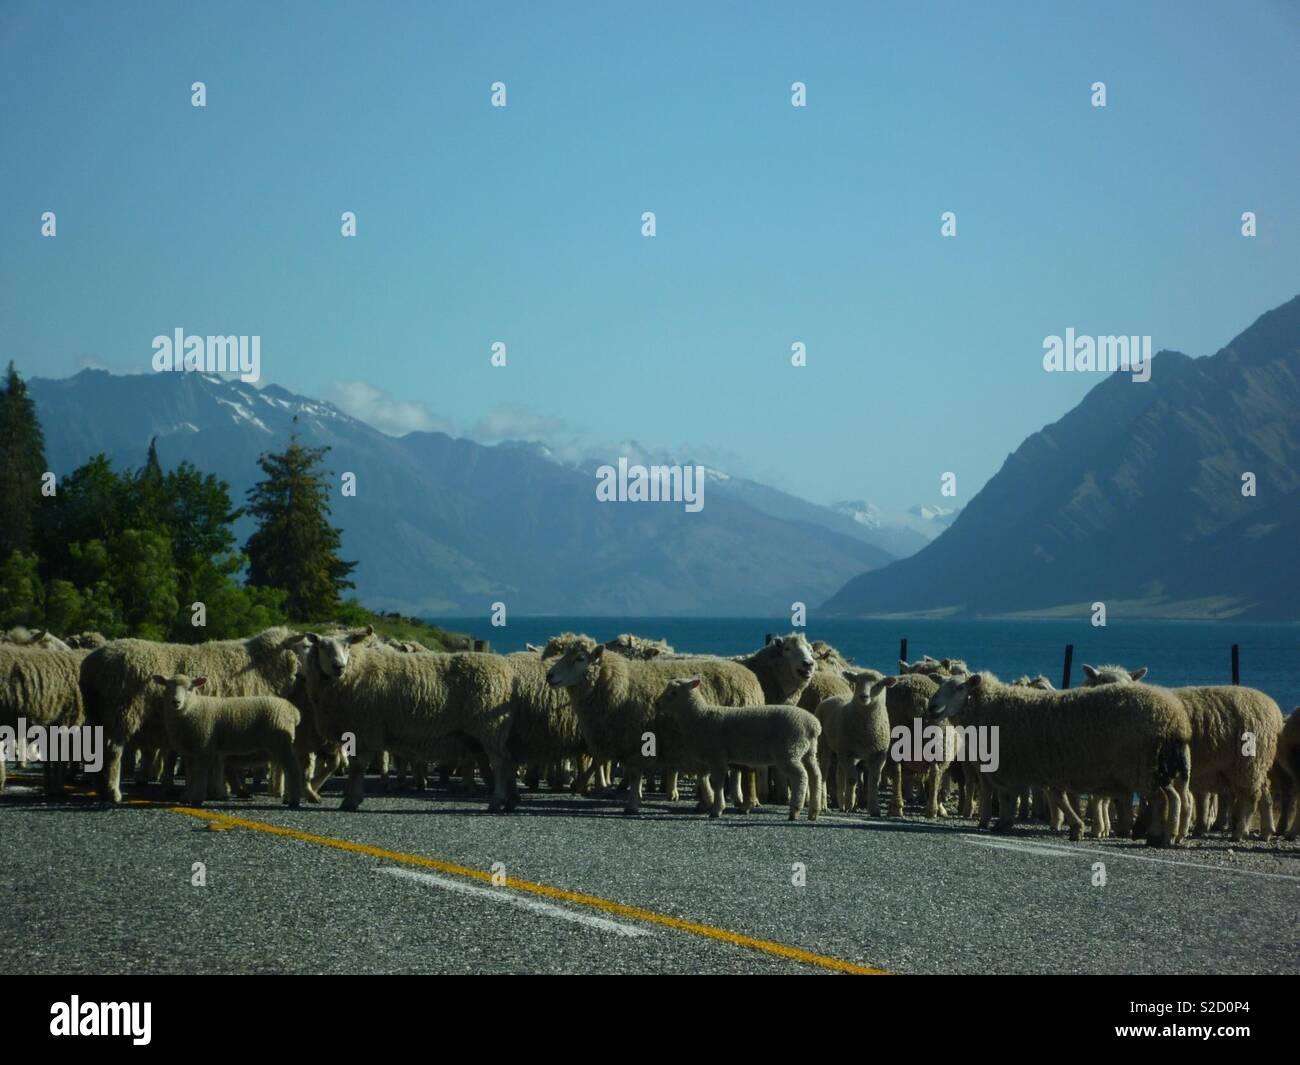 Roadblock New Zealand style! - Stock Image